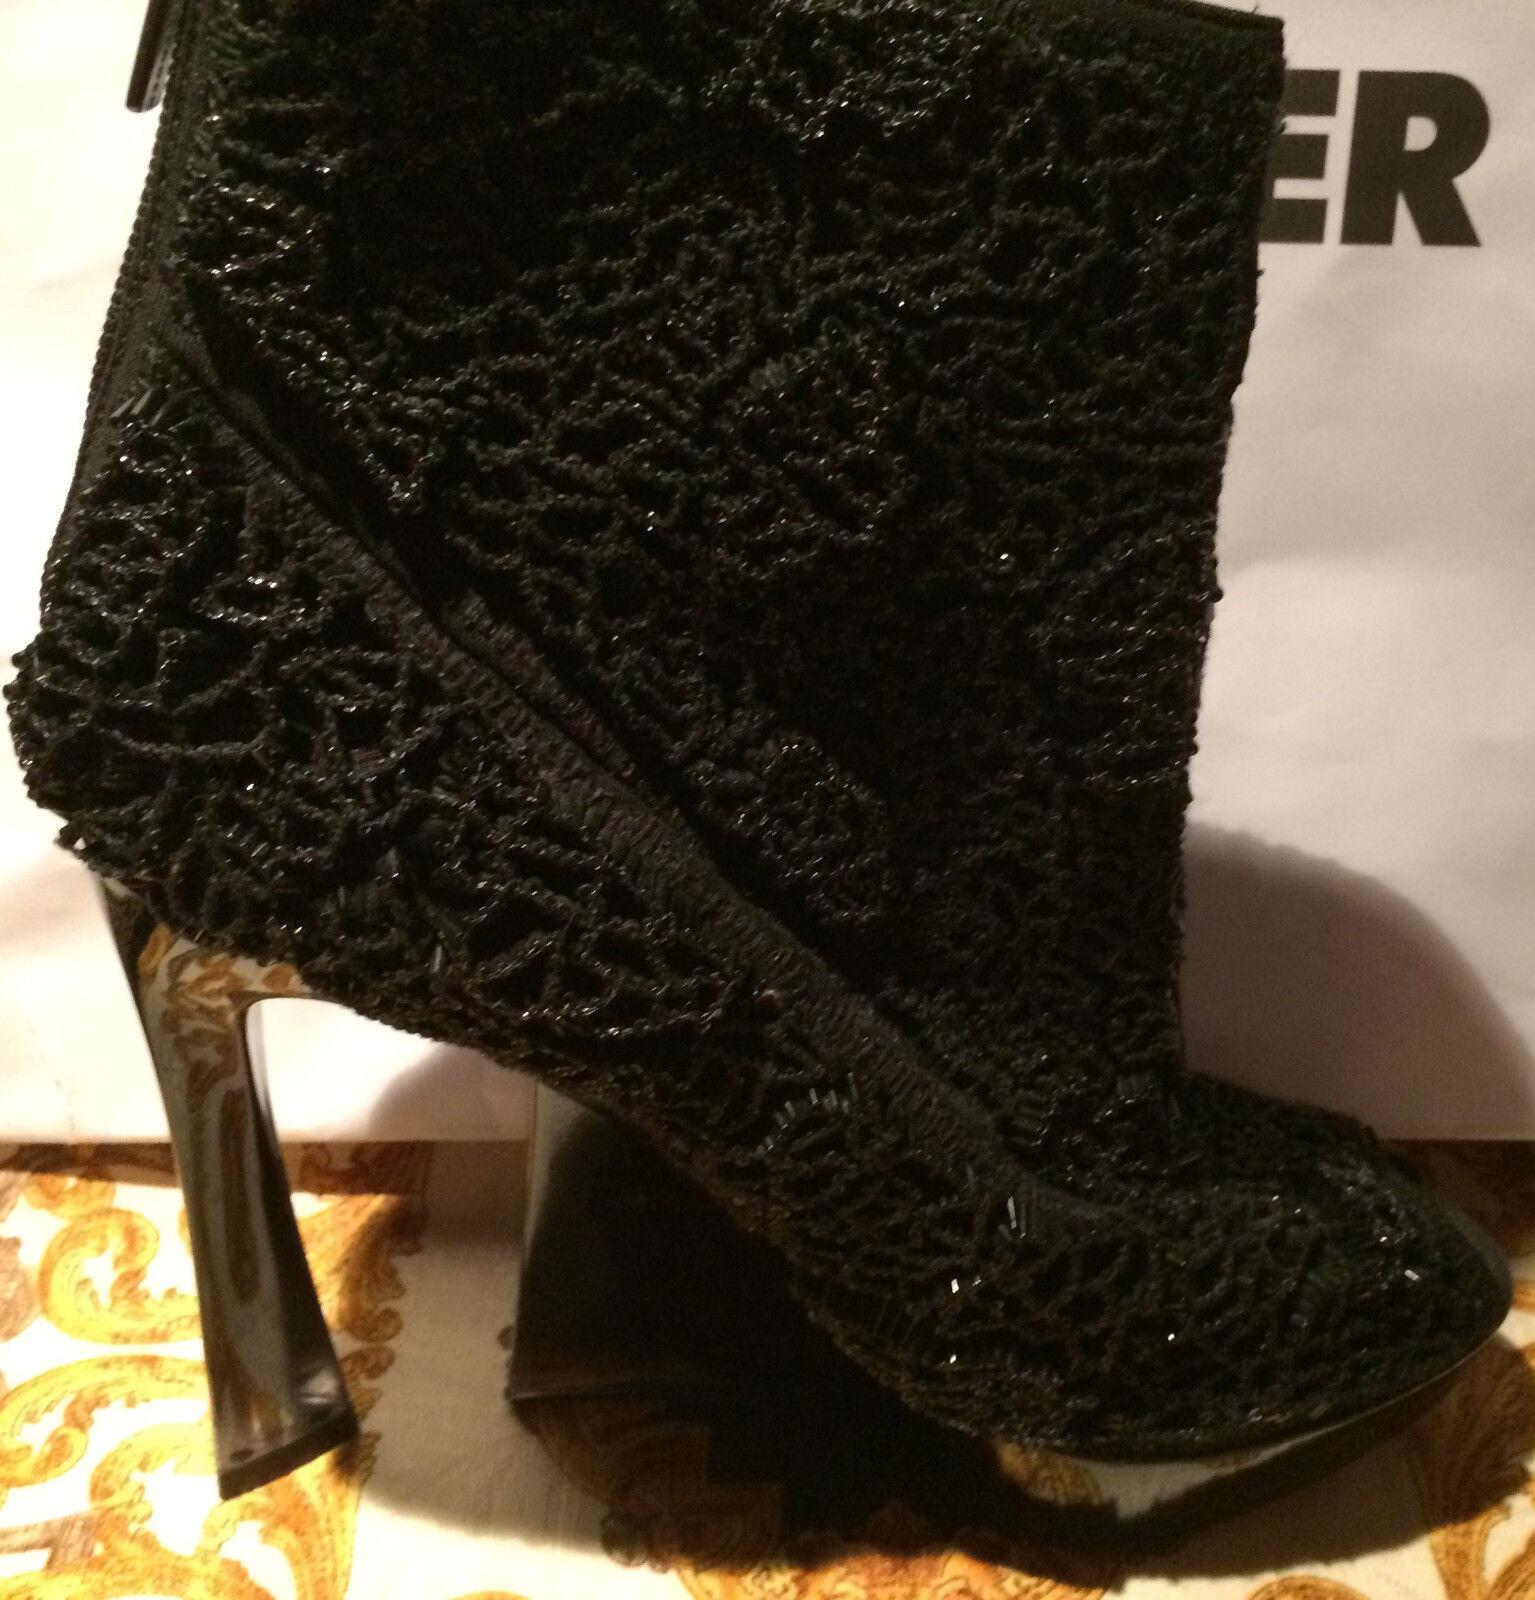 JIL SANDER, 2100 euros, taille taille taille 39, Designer Été Bottines, Chaussures, luxe, couture 64e575